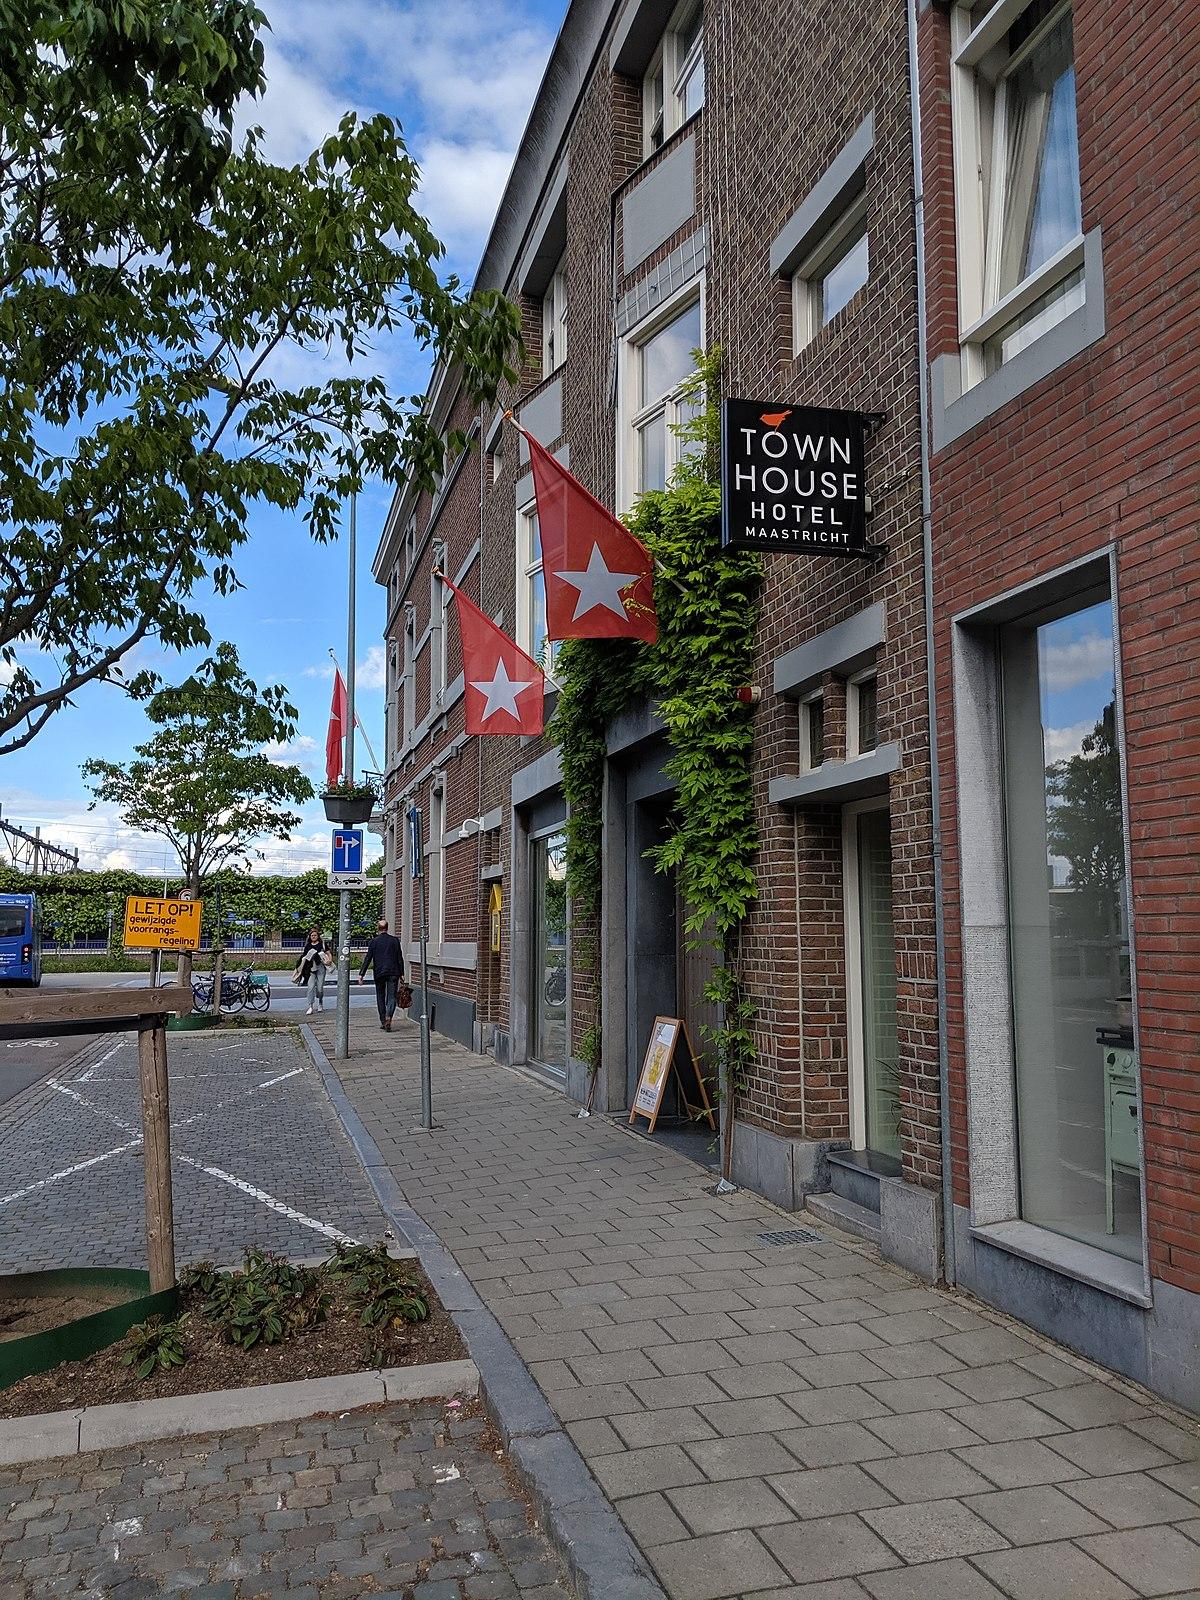 Townhouse Designhotel Maastricht Wikipedia